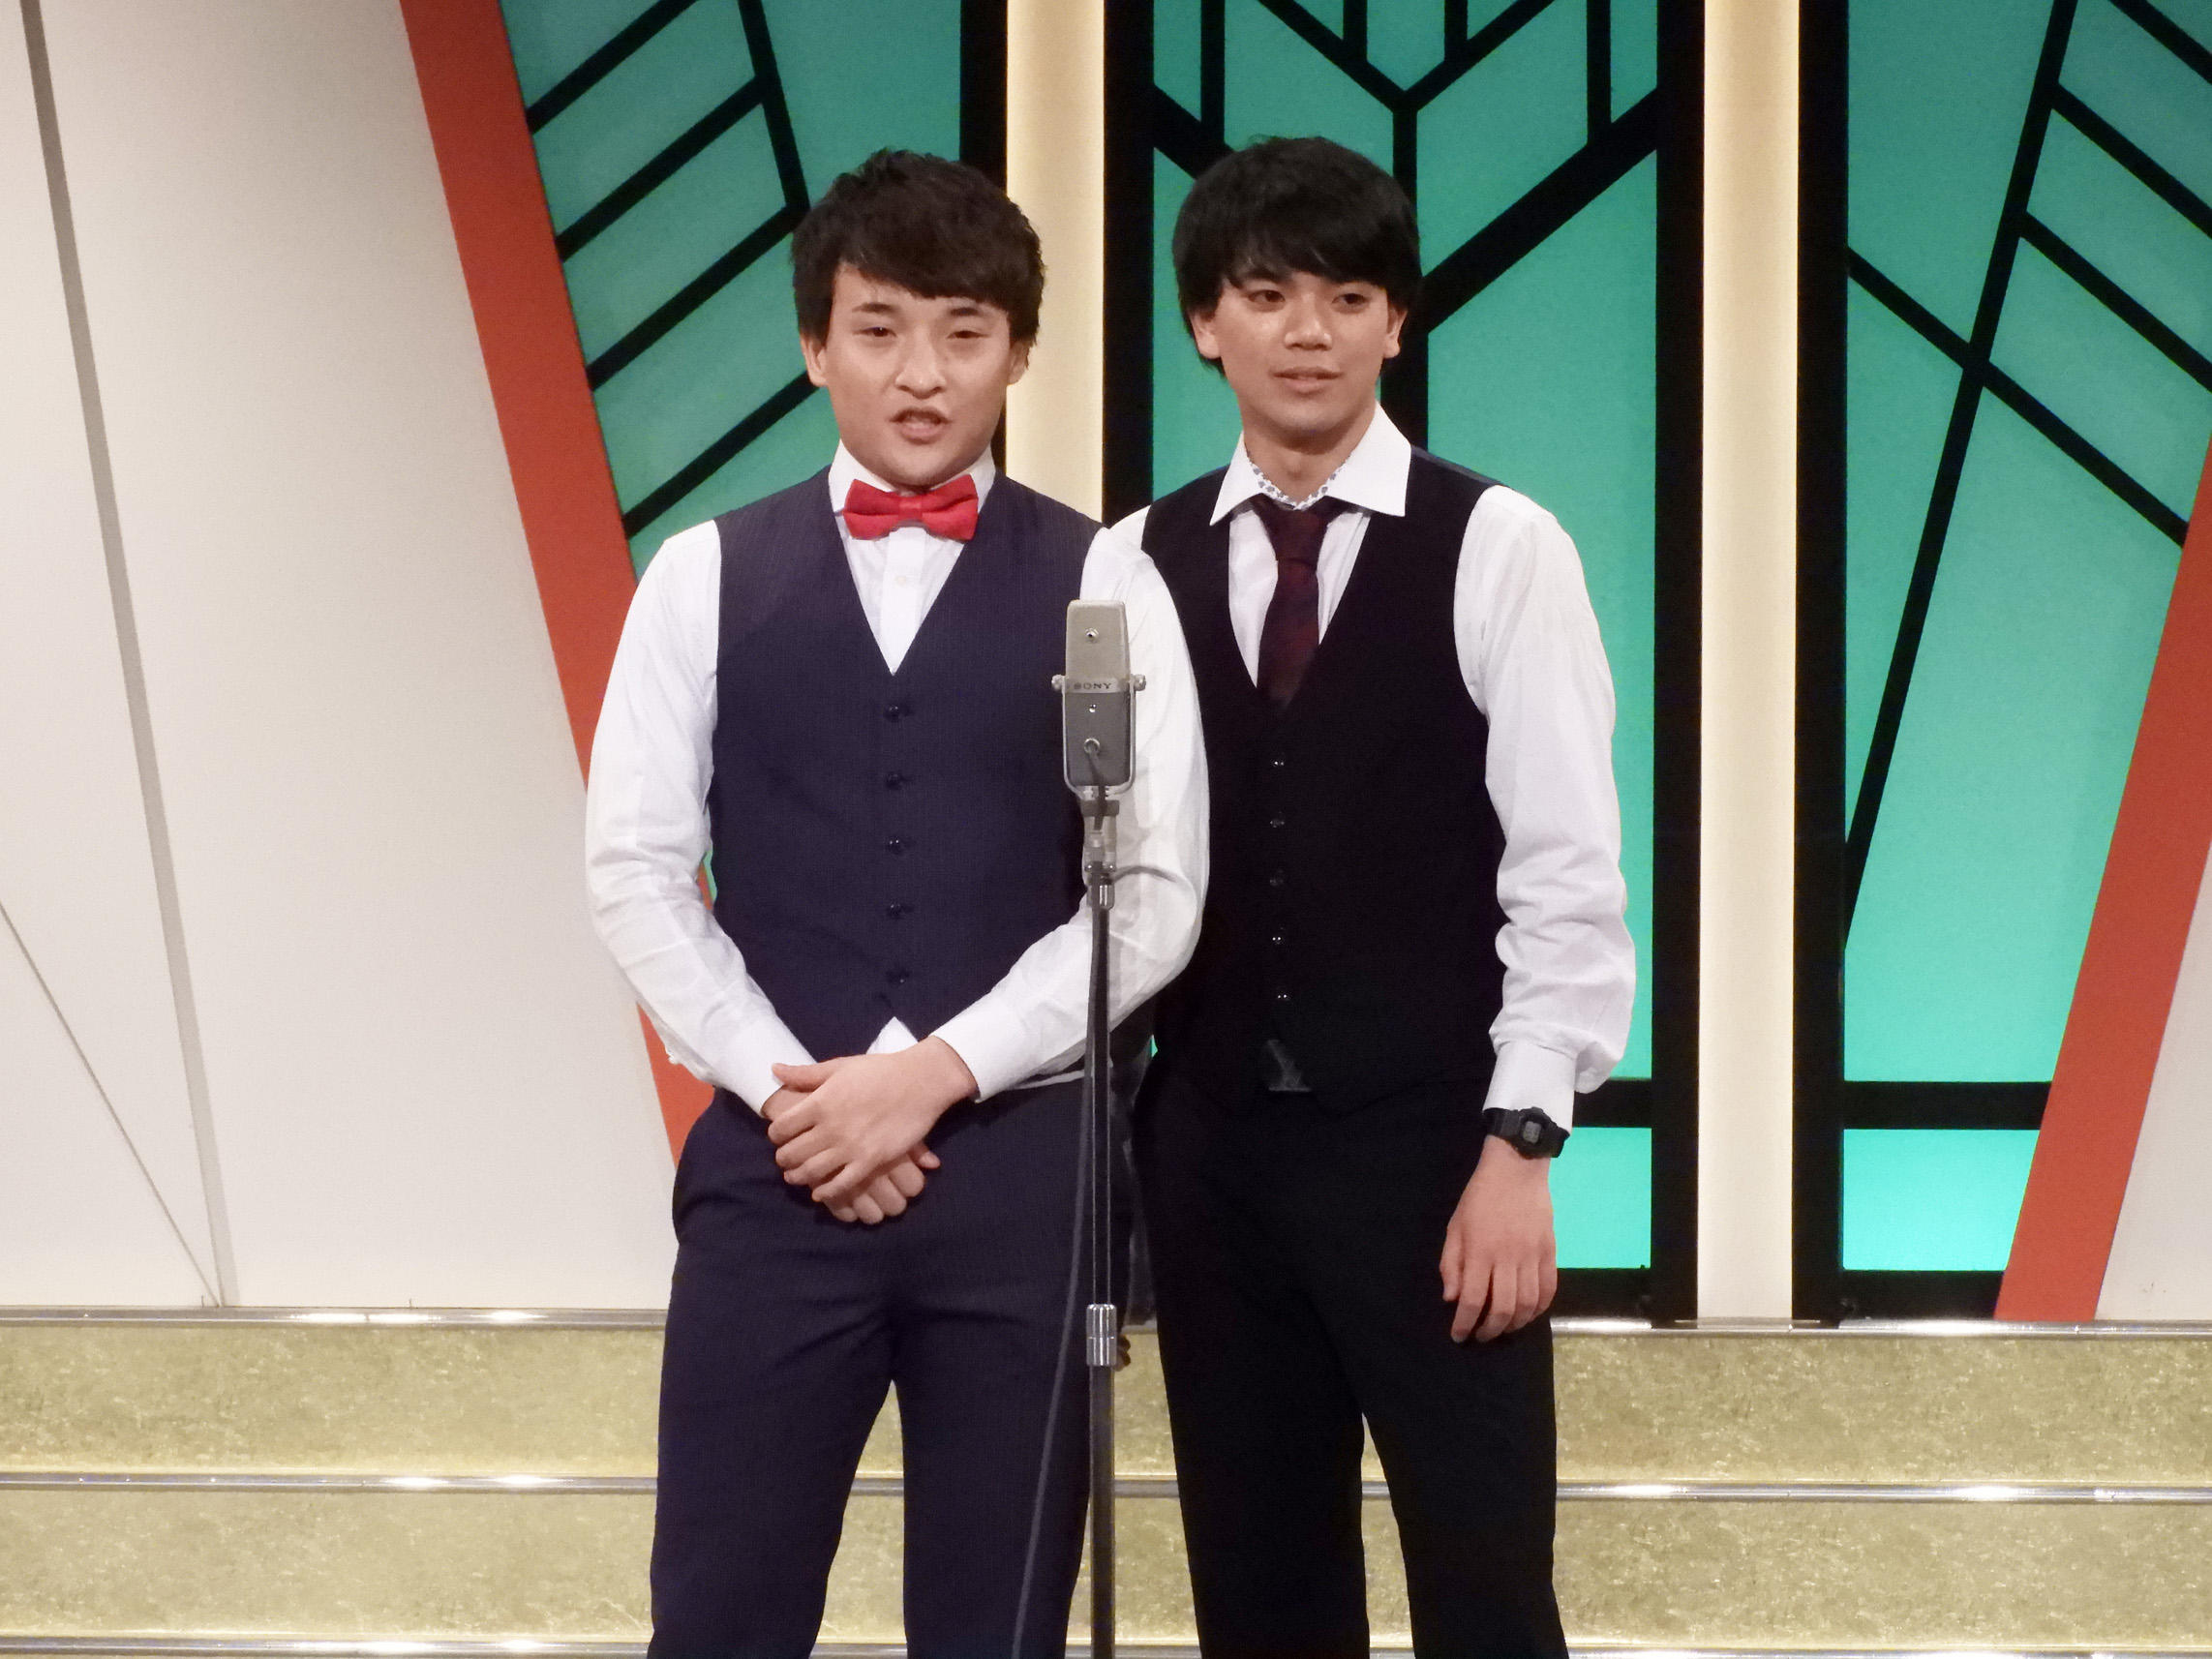 http://news.yoshimoto.co.jp/20180713184723-8672eac671fc5631d3ee721dde8357c6ce4116a2.jpg